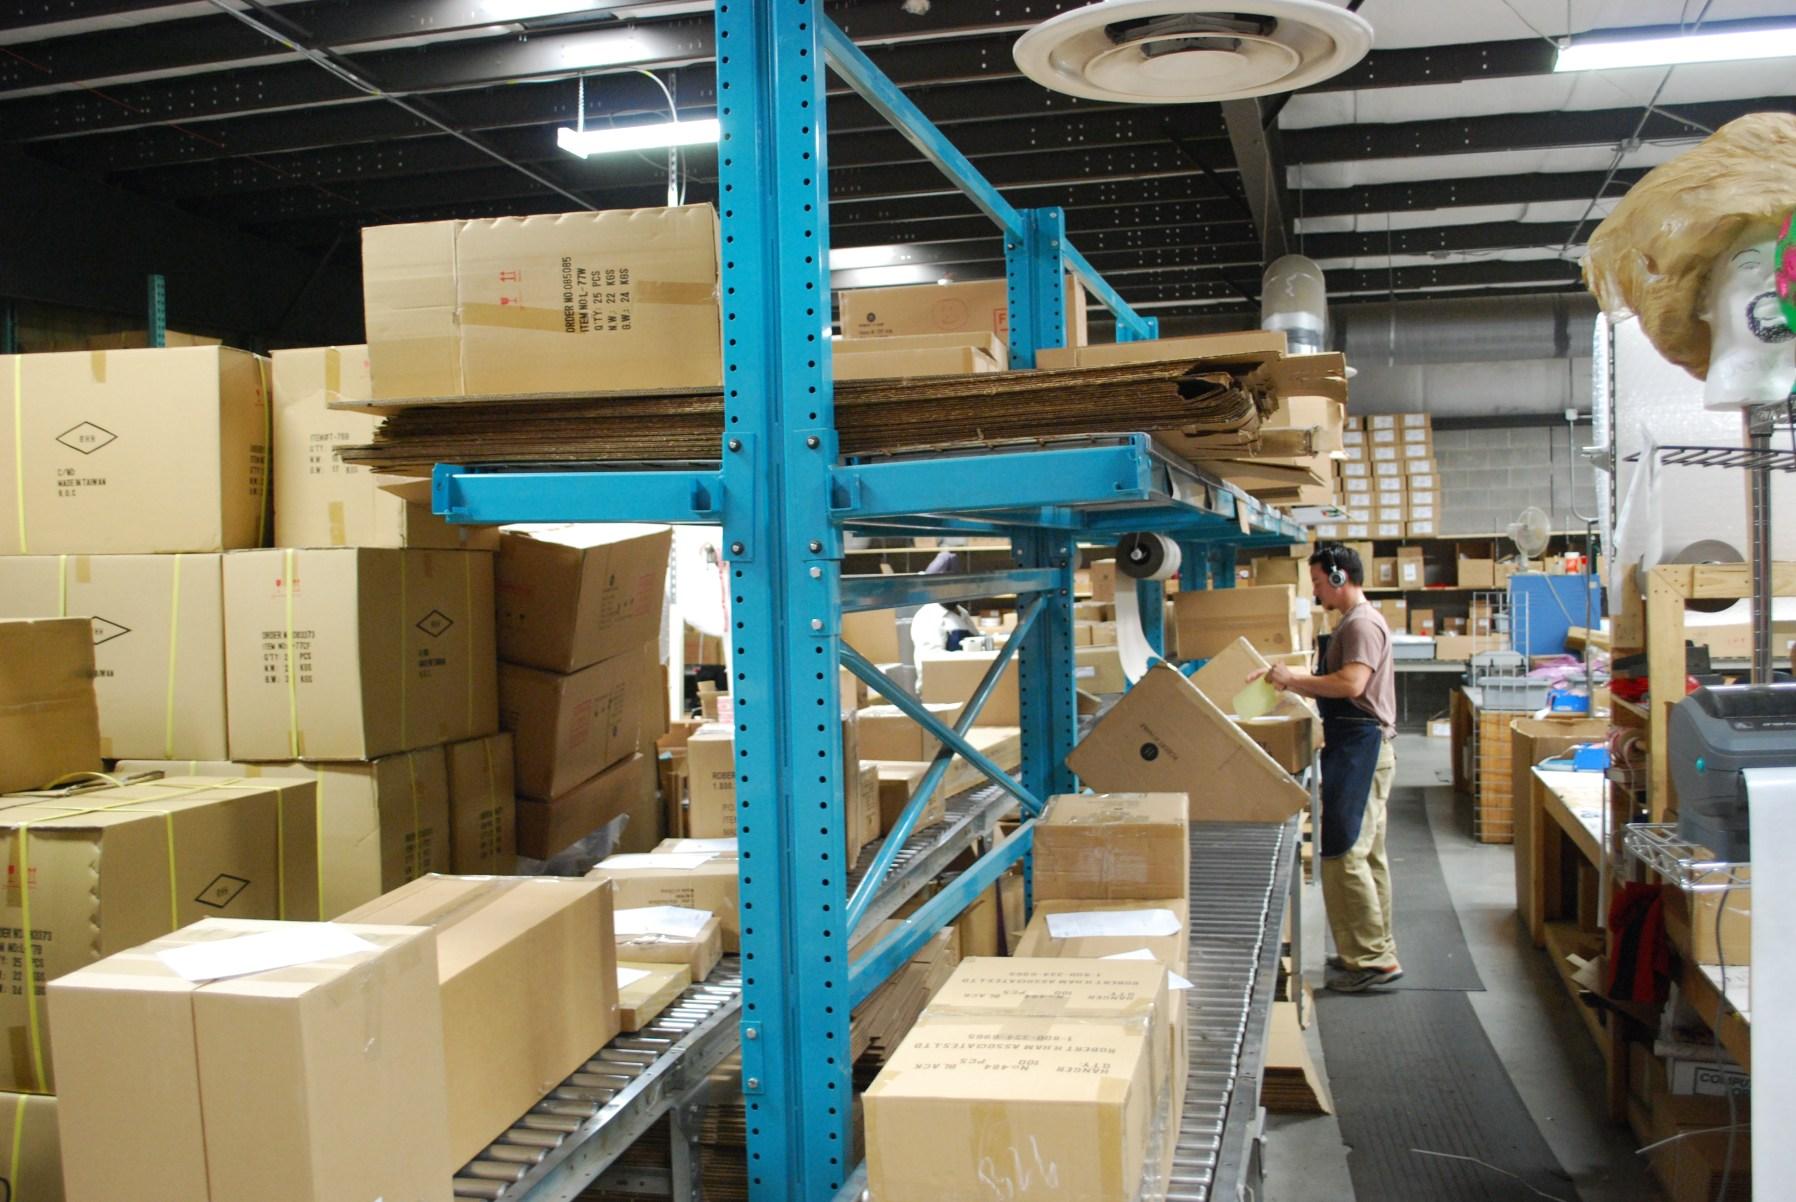 Cantilevered Shelves Over Conveyor